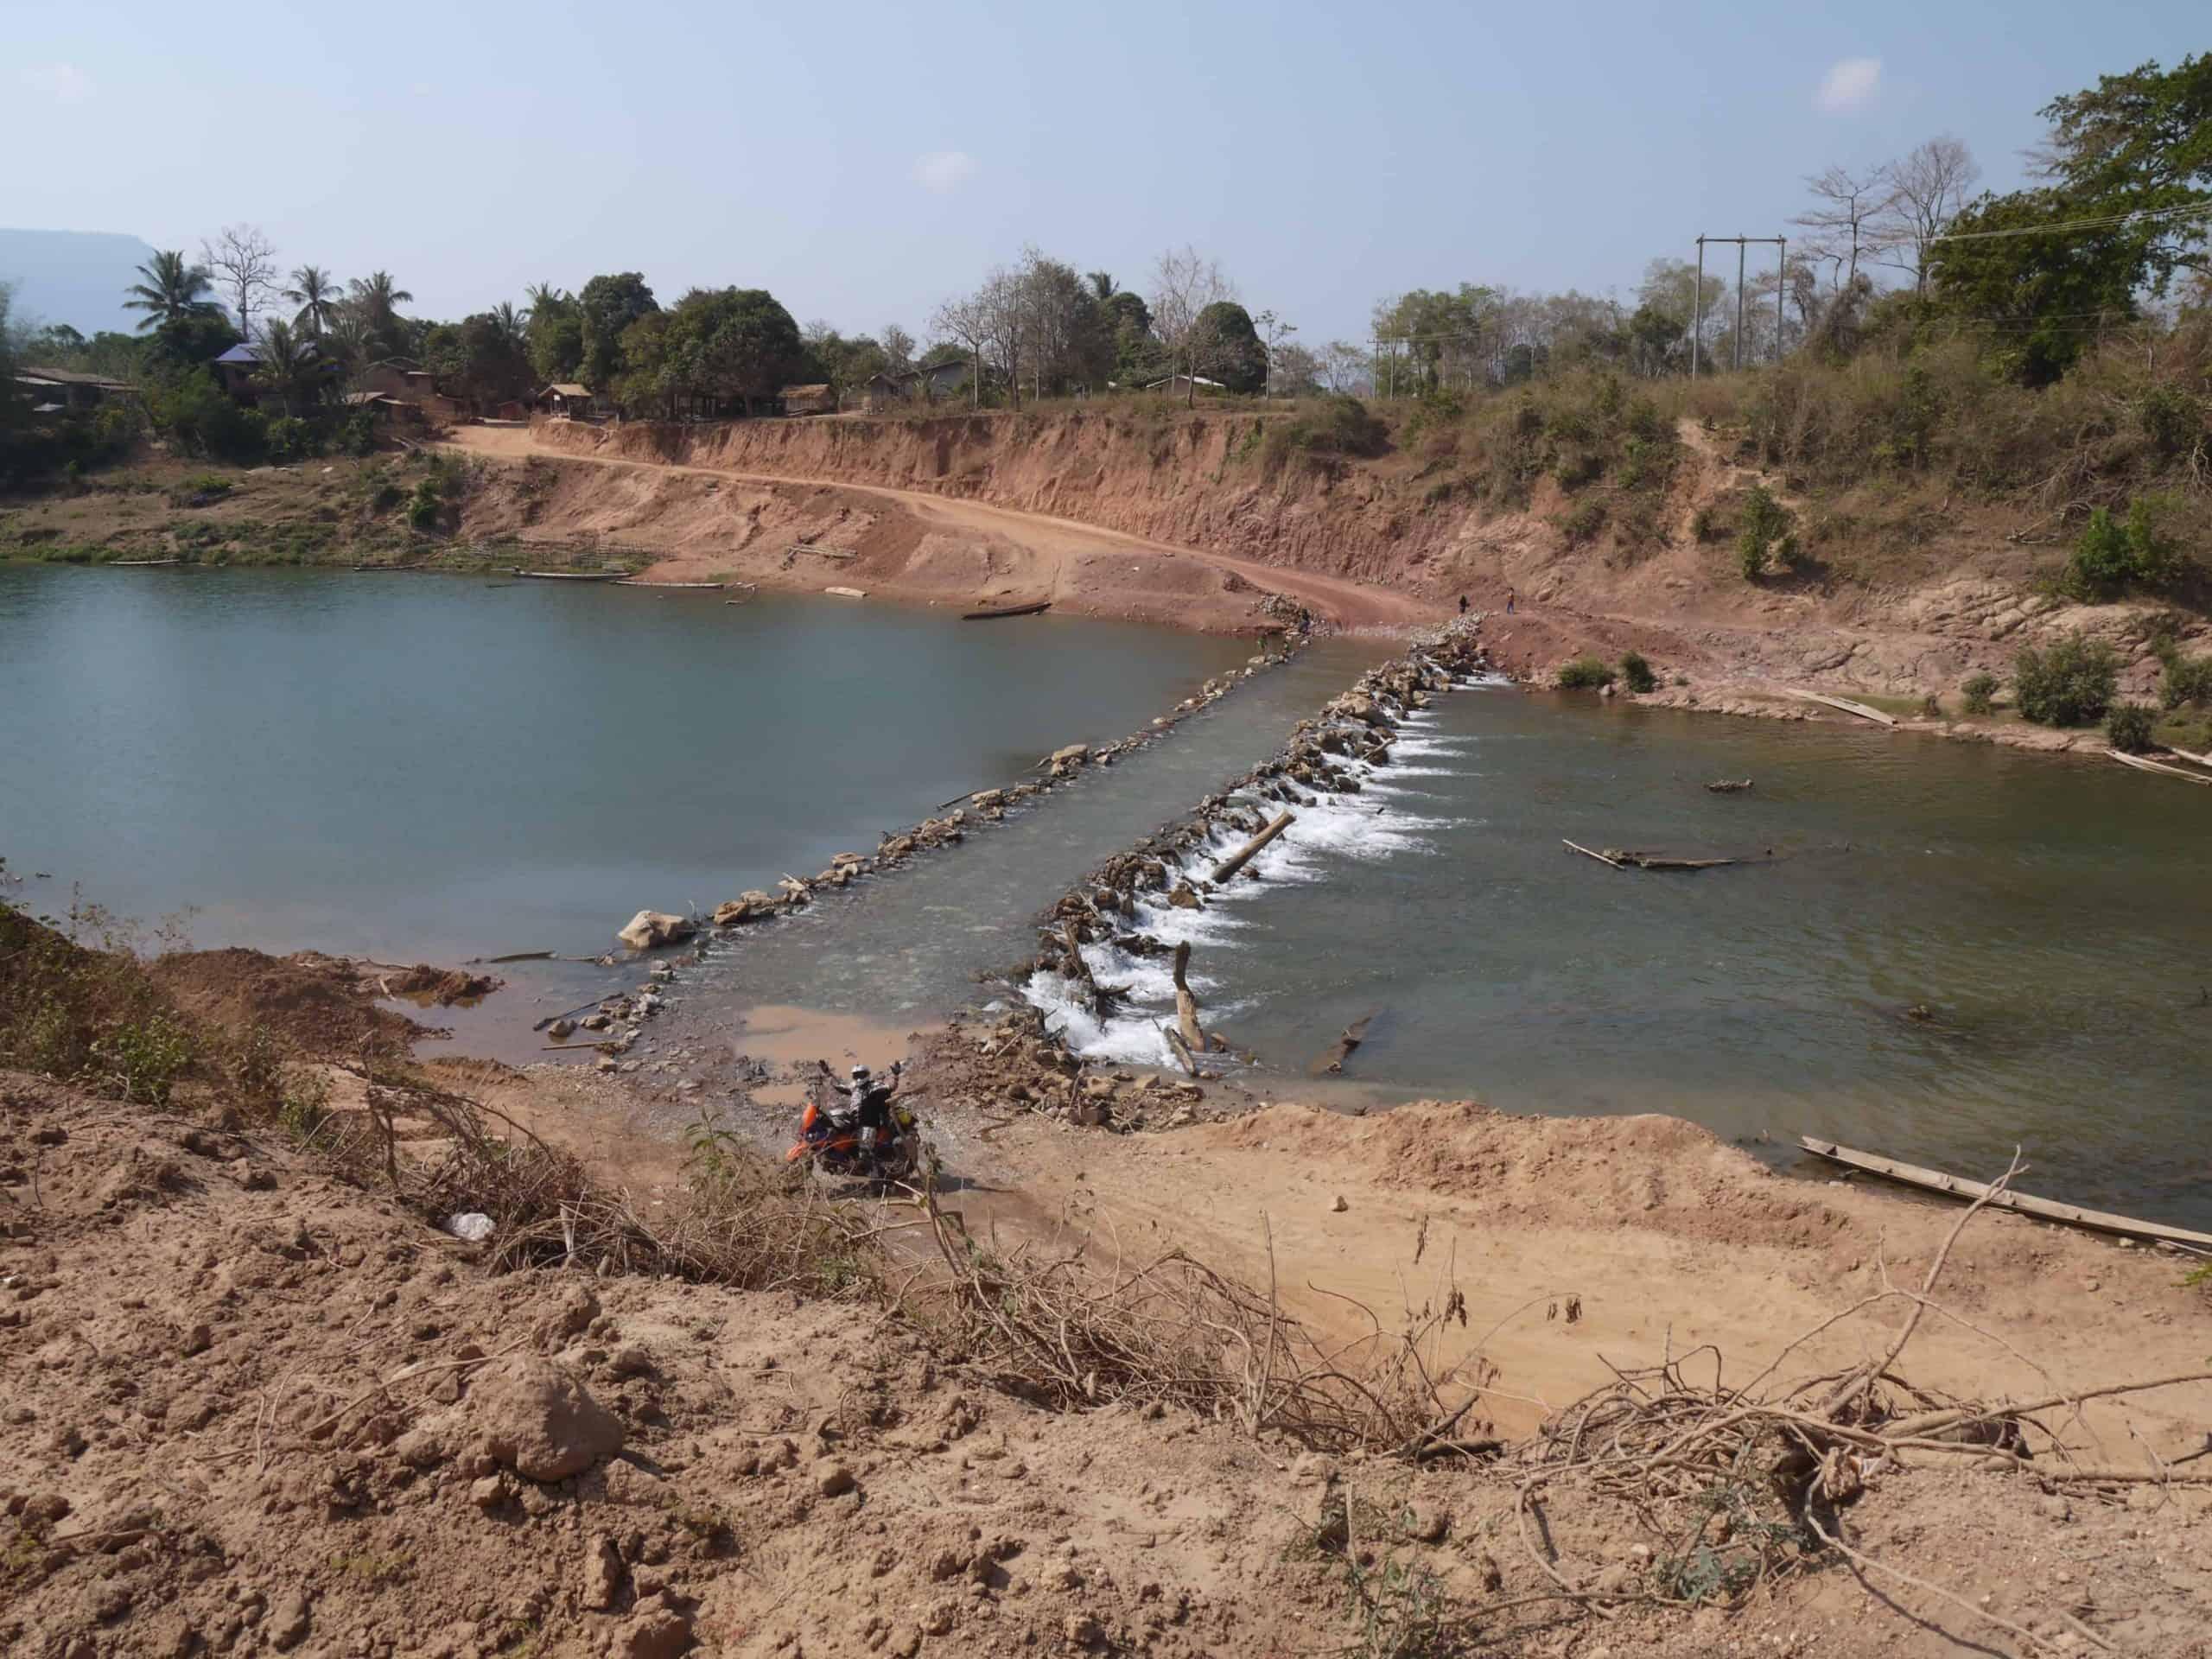 forded-river-crossings-Laos-Ho-Chi-Minh-Trail-wet-season-flooded